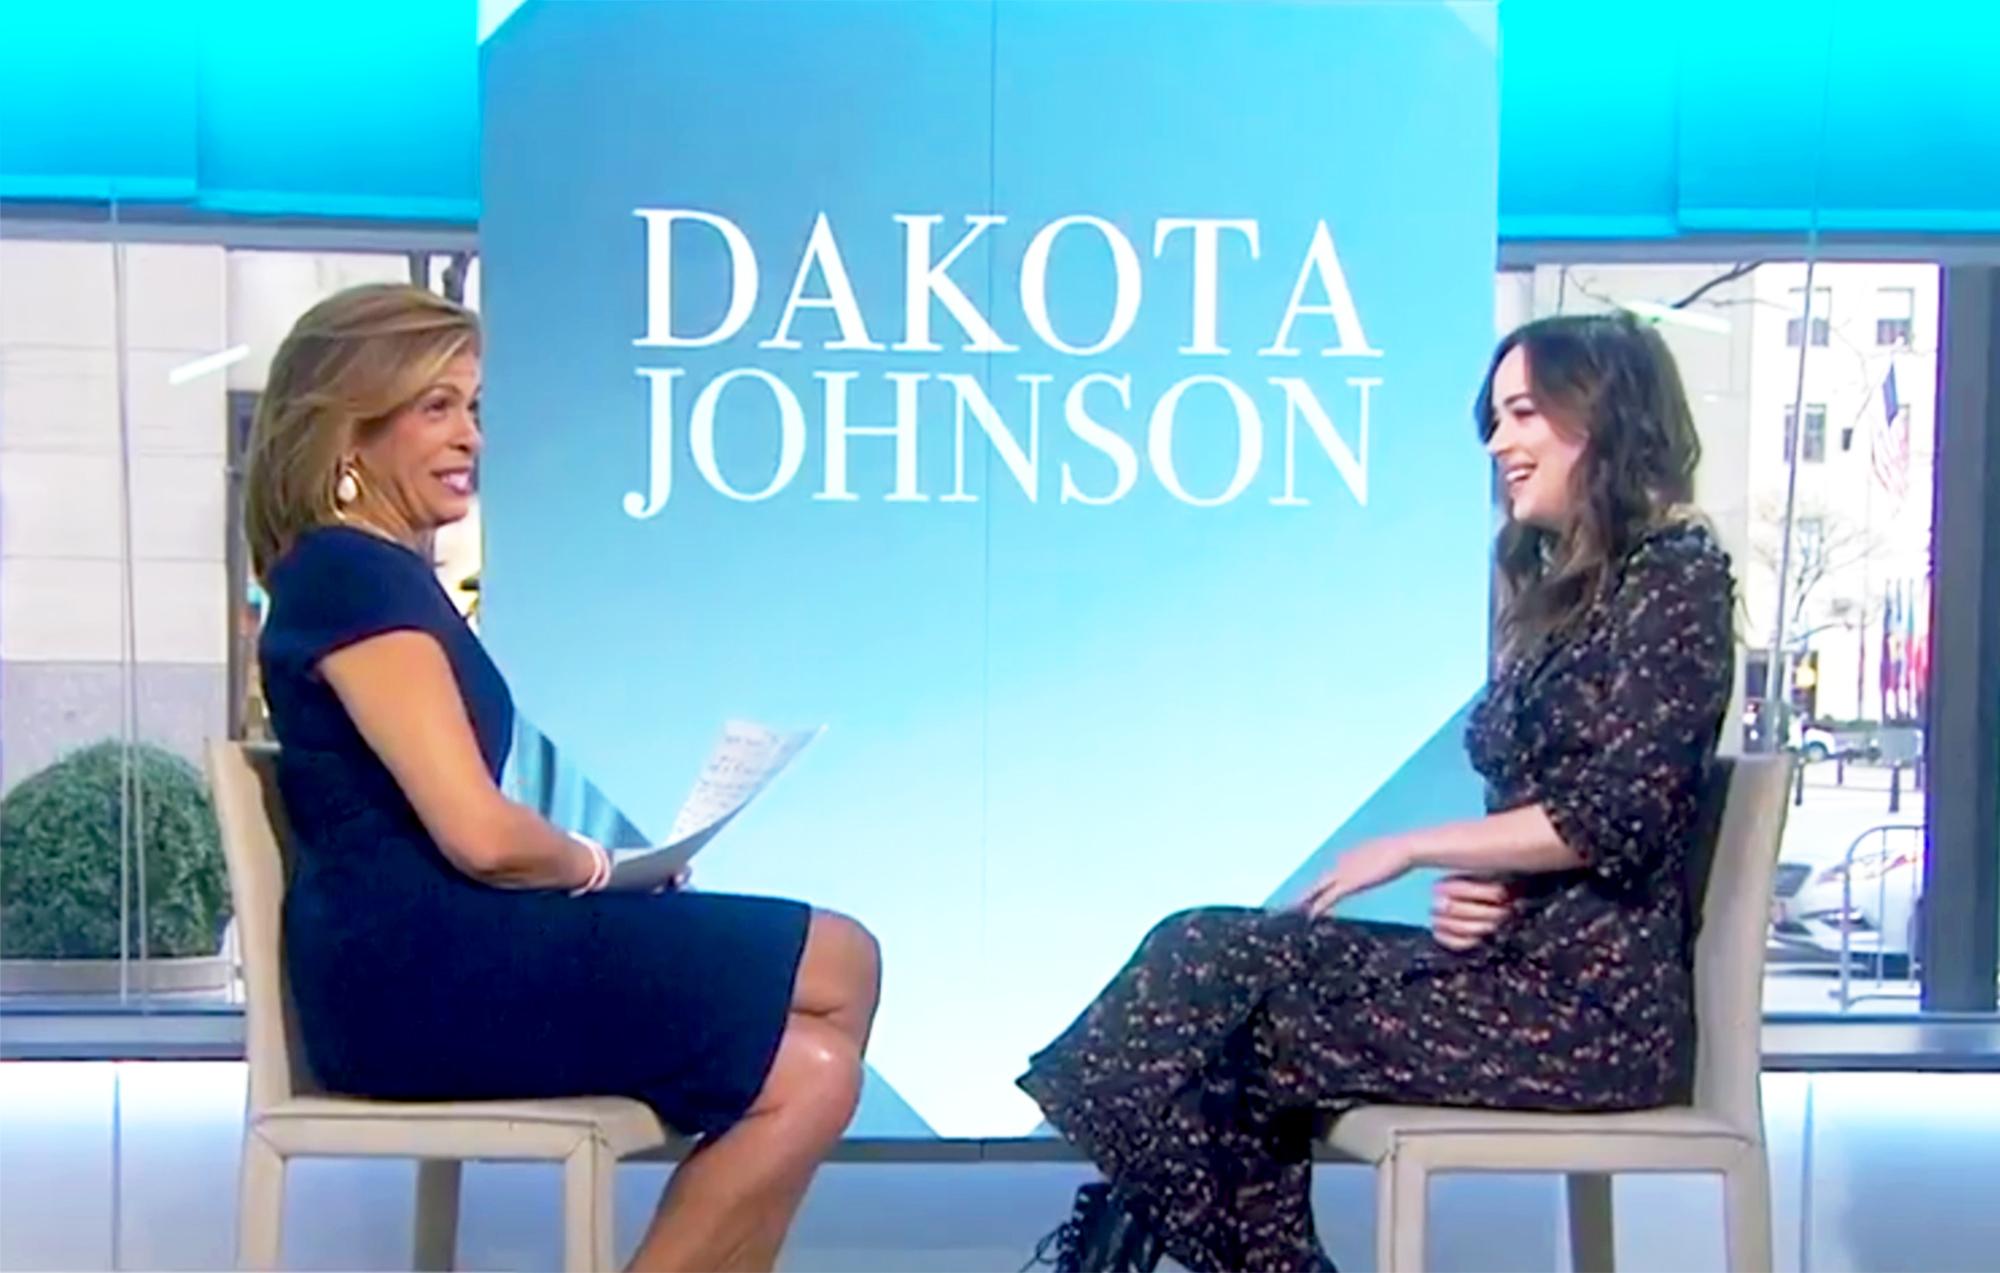 Hoda Kotb and Dakota Johnson